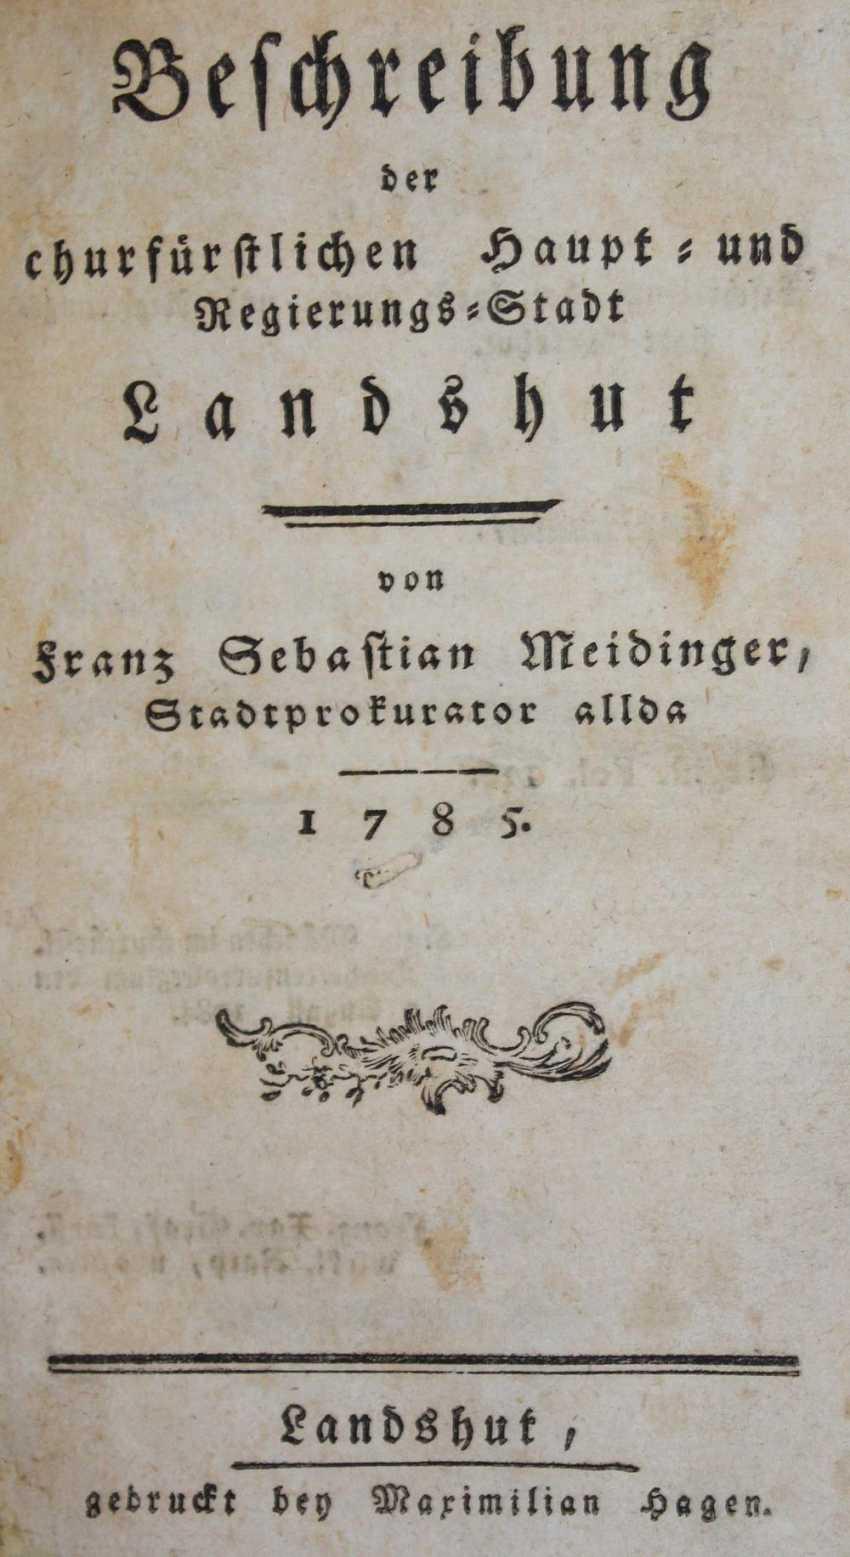 Meidinger, F.S. - photo 1